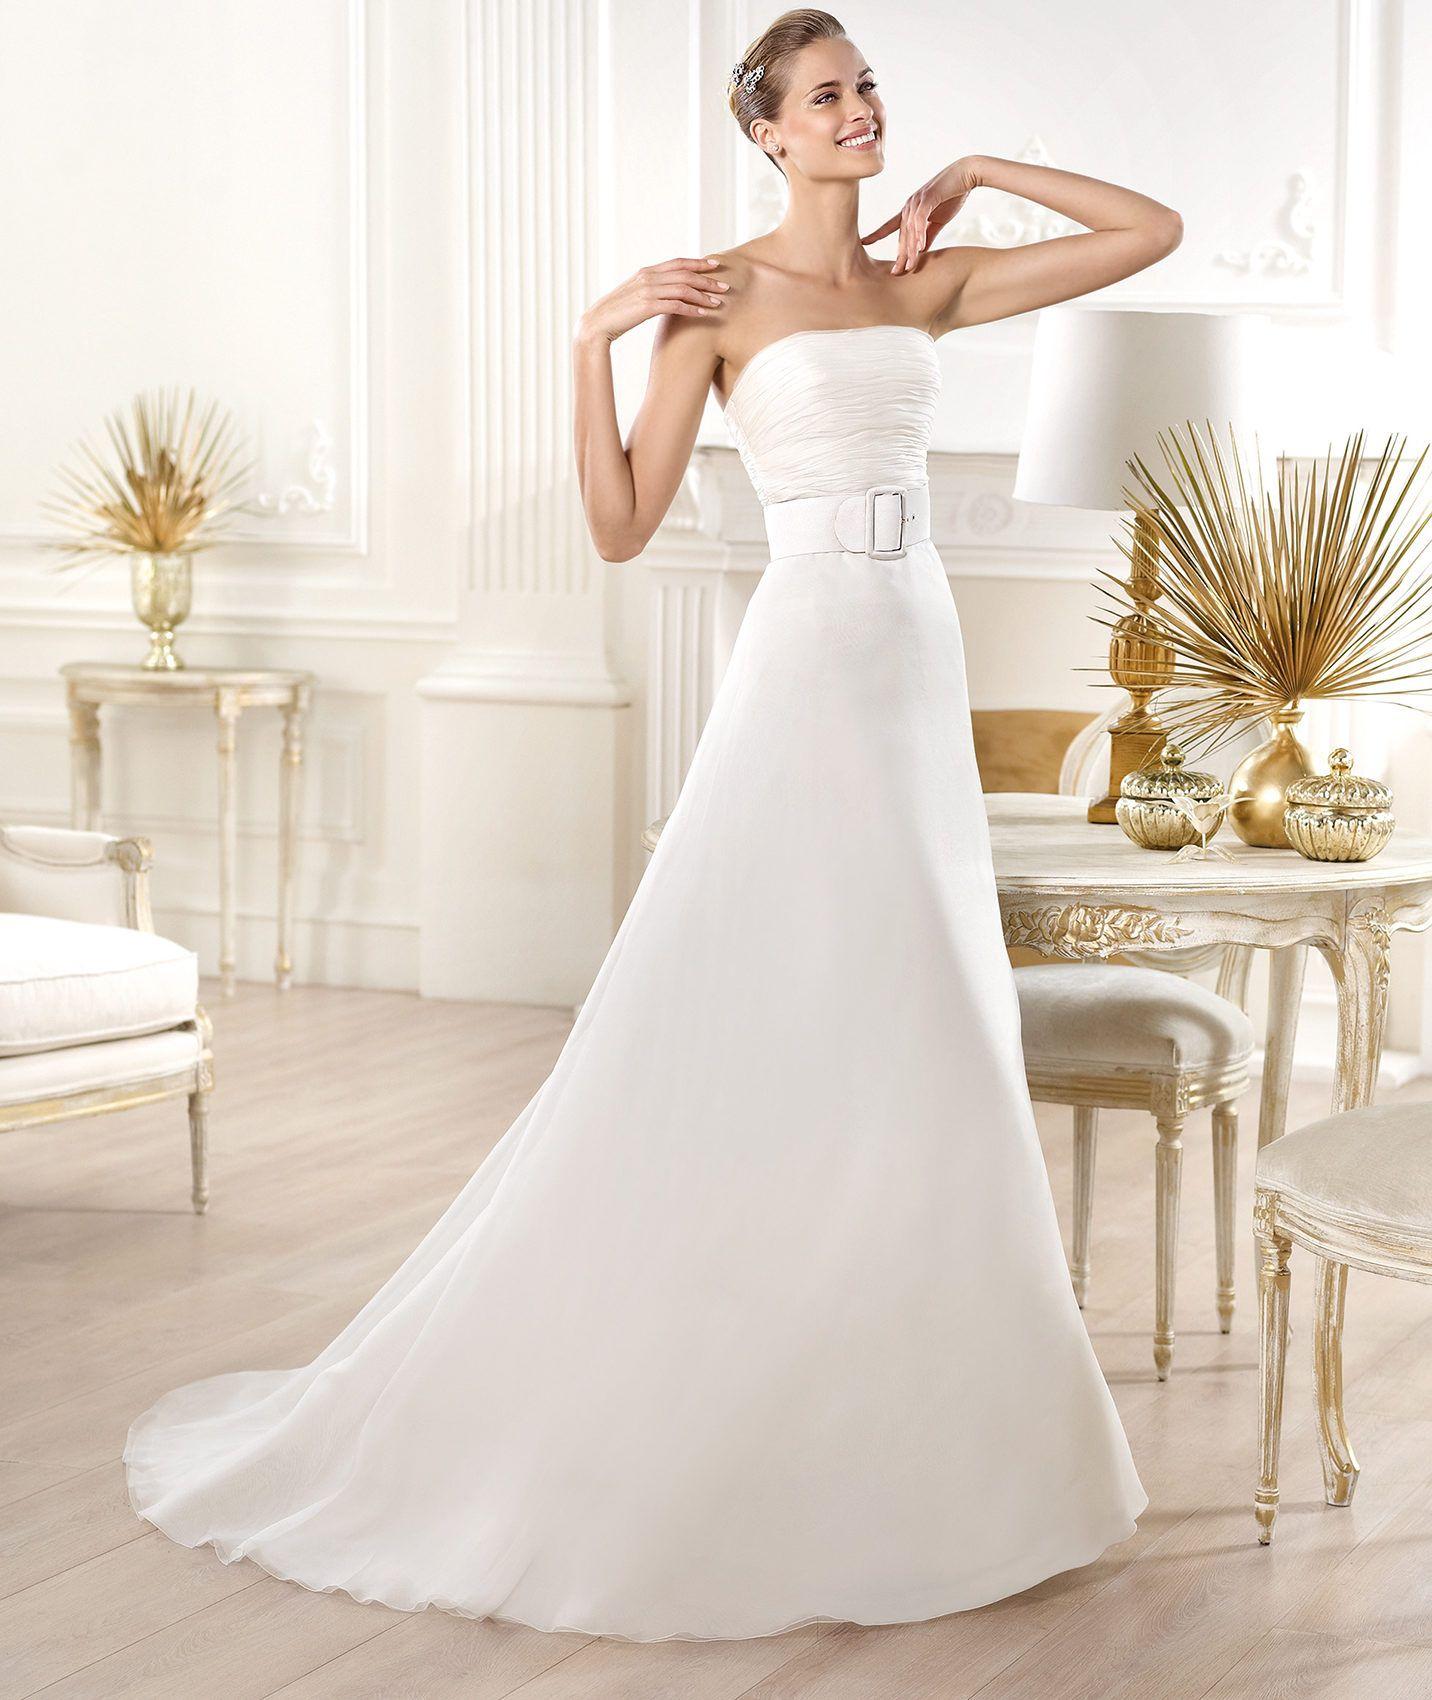 Pronovias presents the Yesalem wedding dress. Atelier Pronovias 2014. | Pronovias